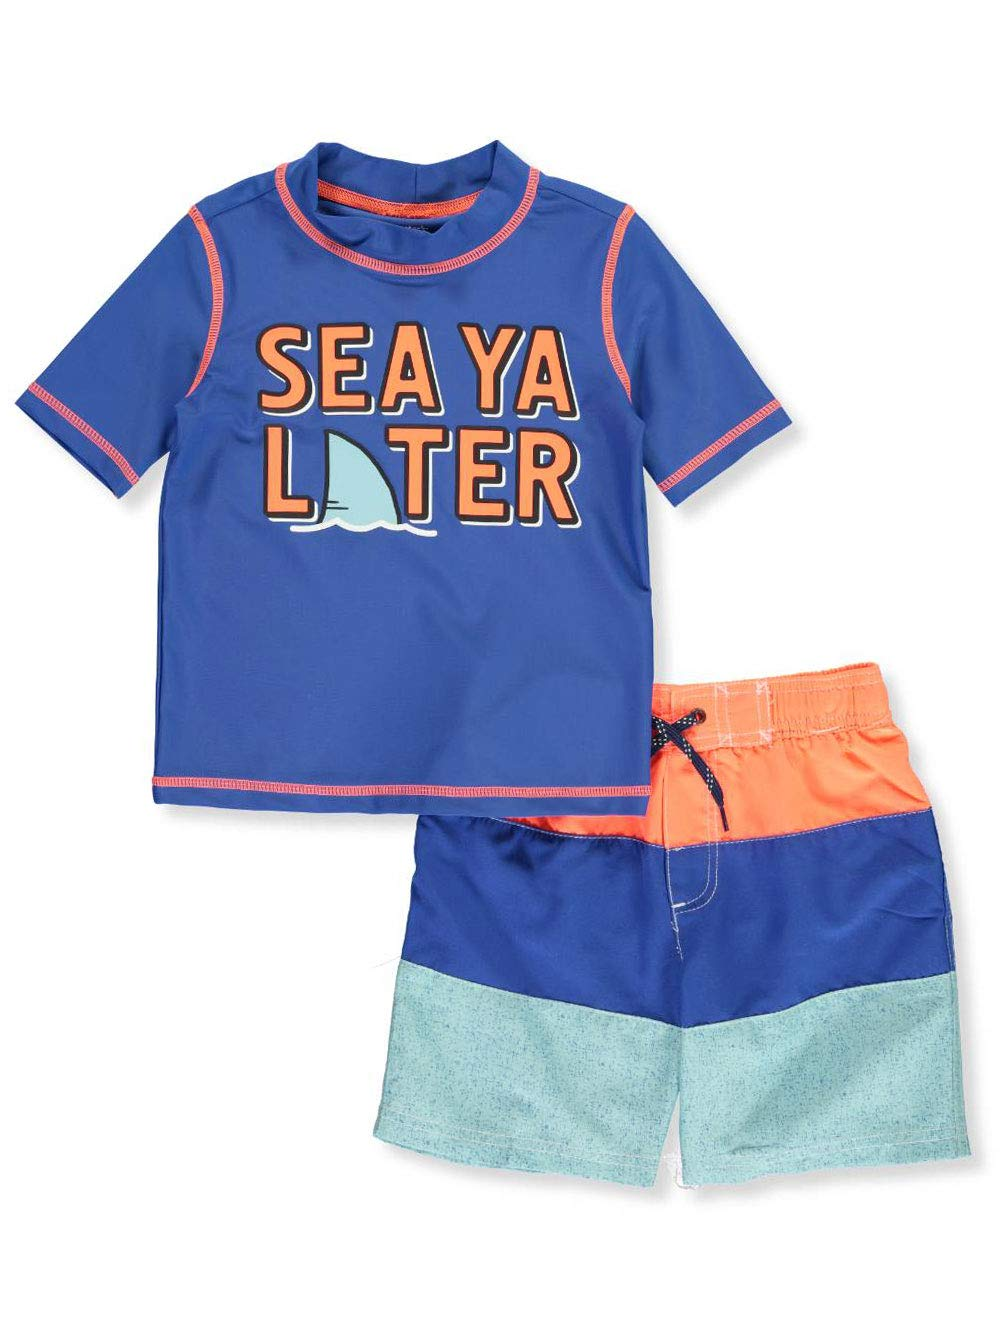 Carter's Toddler Boys' Rashguard Swim Set, See Ya